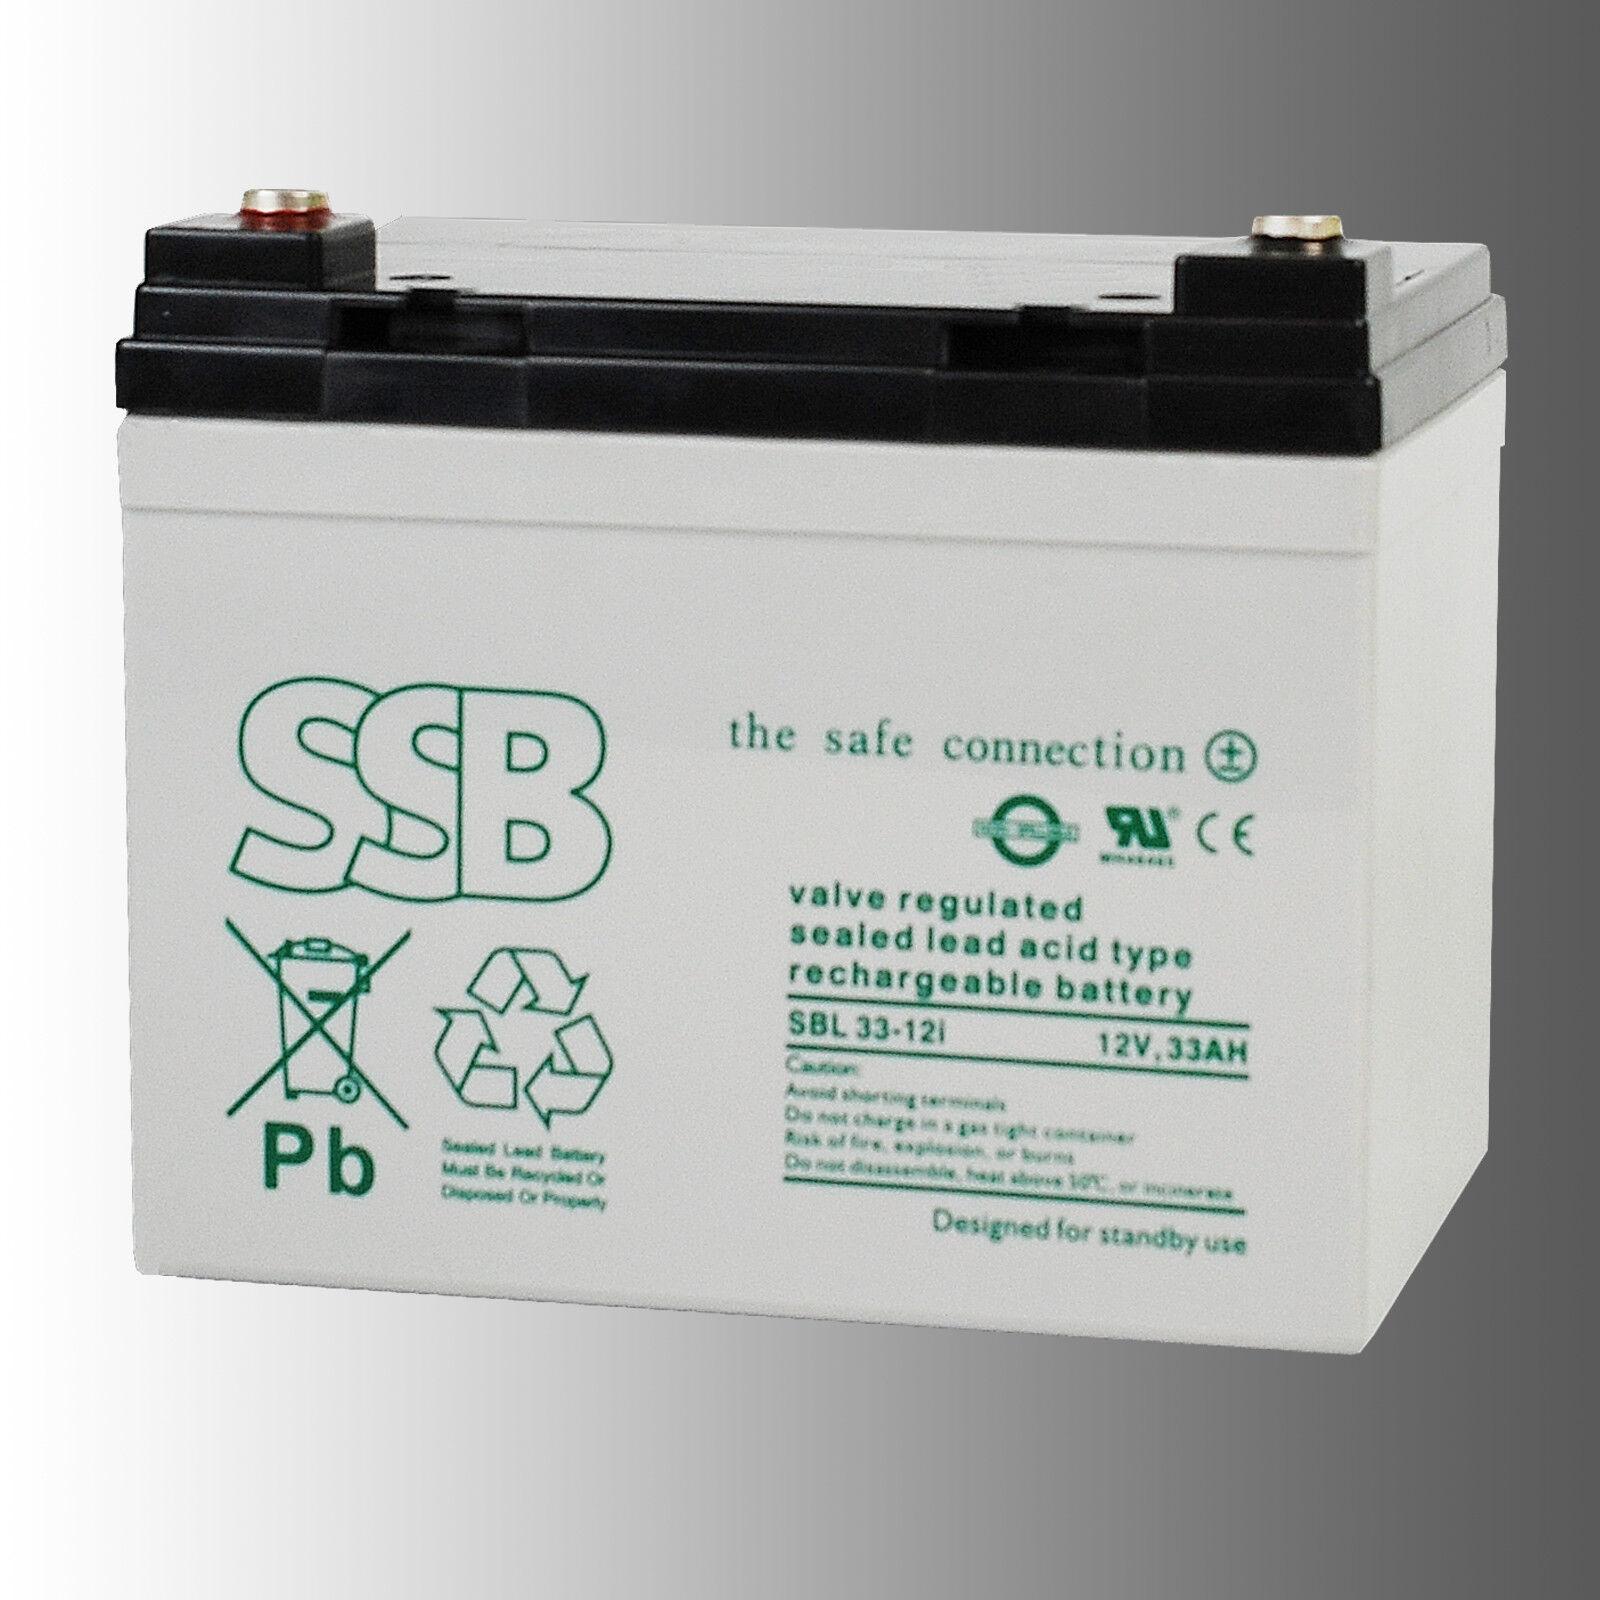 SSB Bleibatterie SBL 33-12i 12V 33Ah Longlife